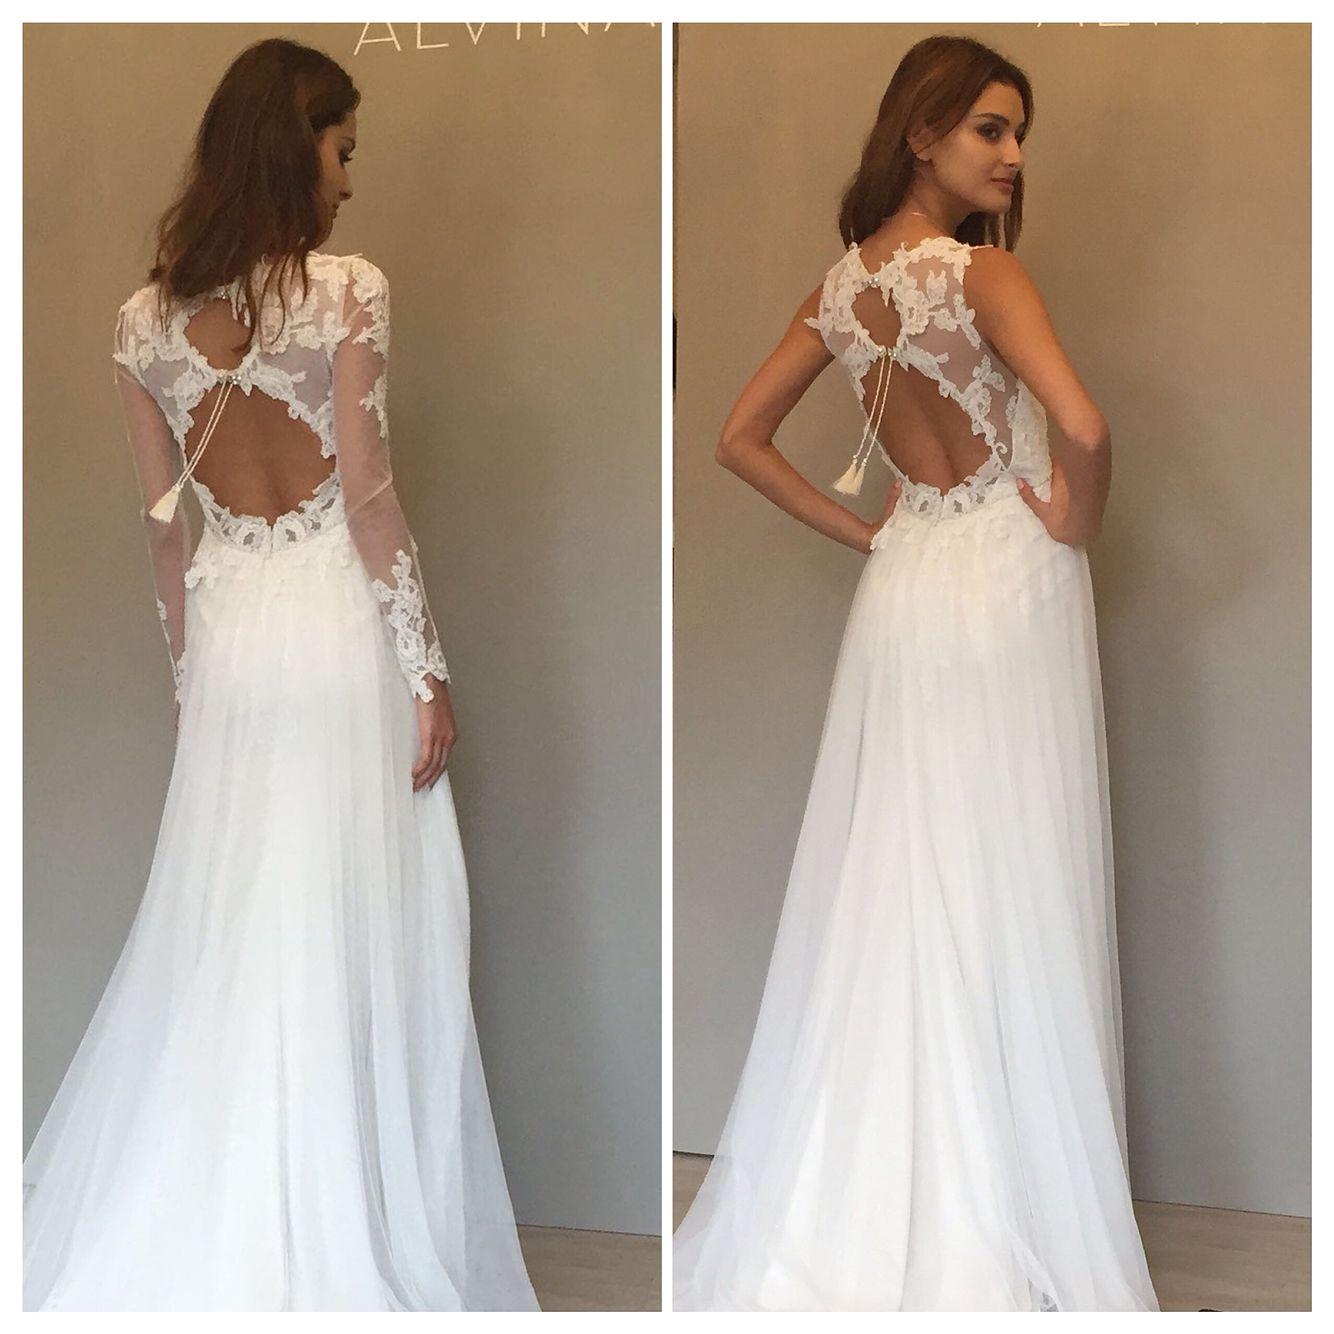 Alvina Valenta Style 9558 with detachable long sleeves